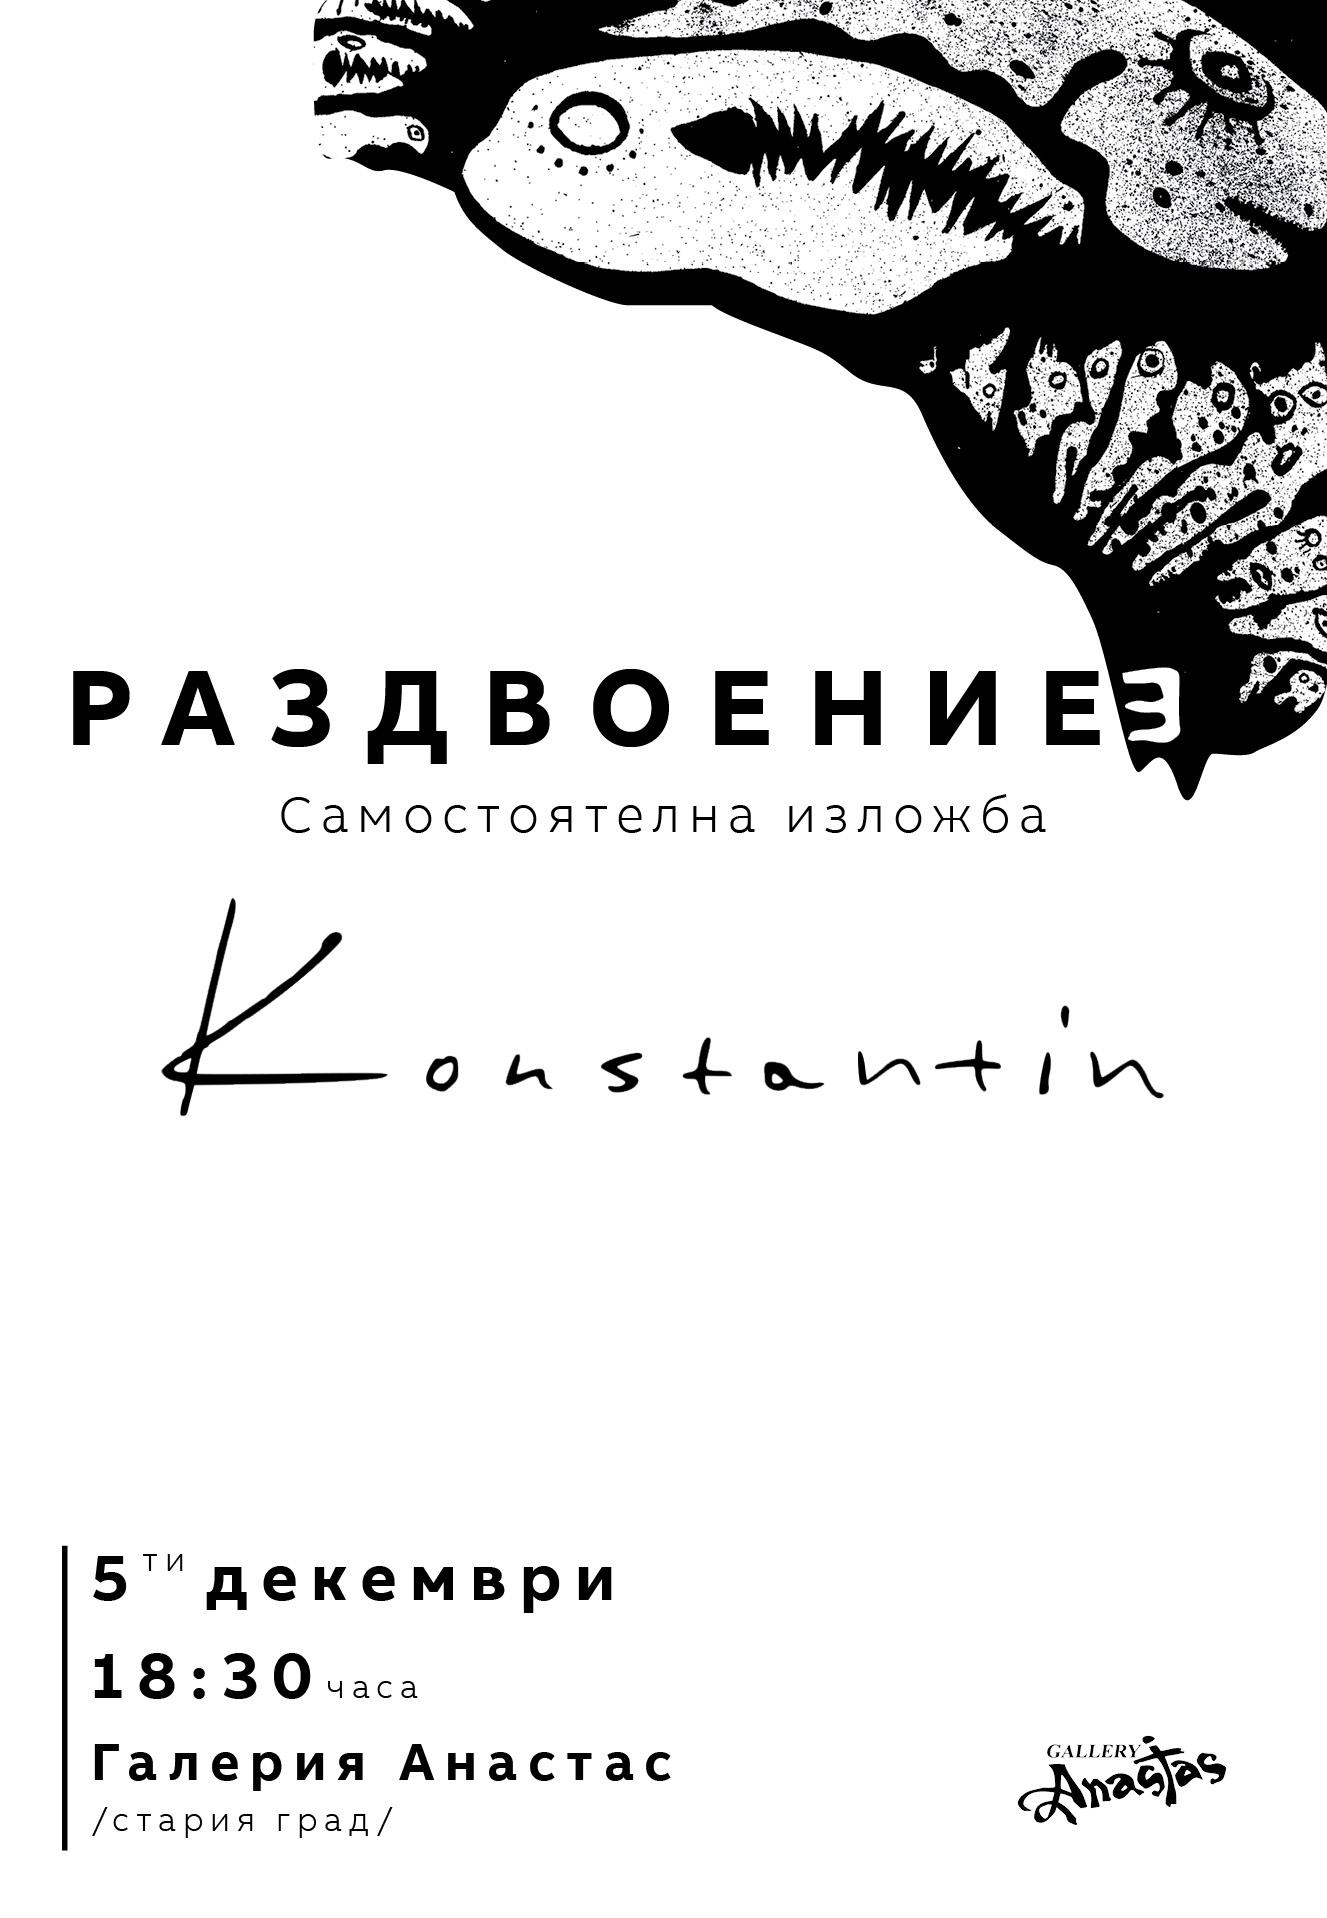 Konstantin_Konstantinov_izlozhba